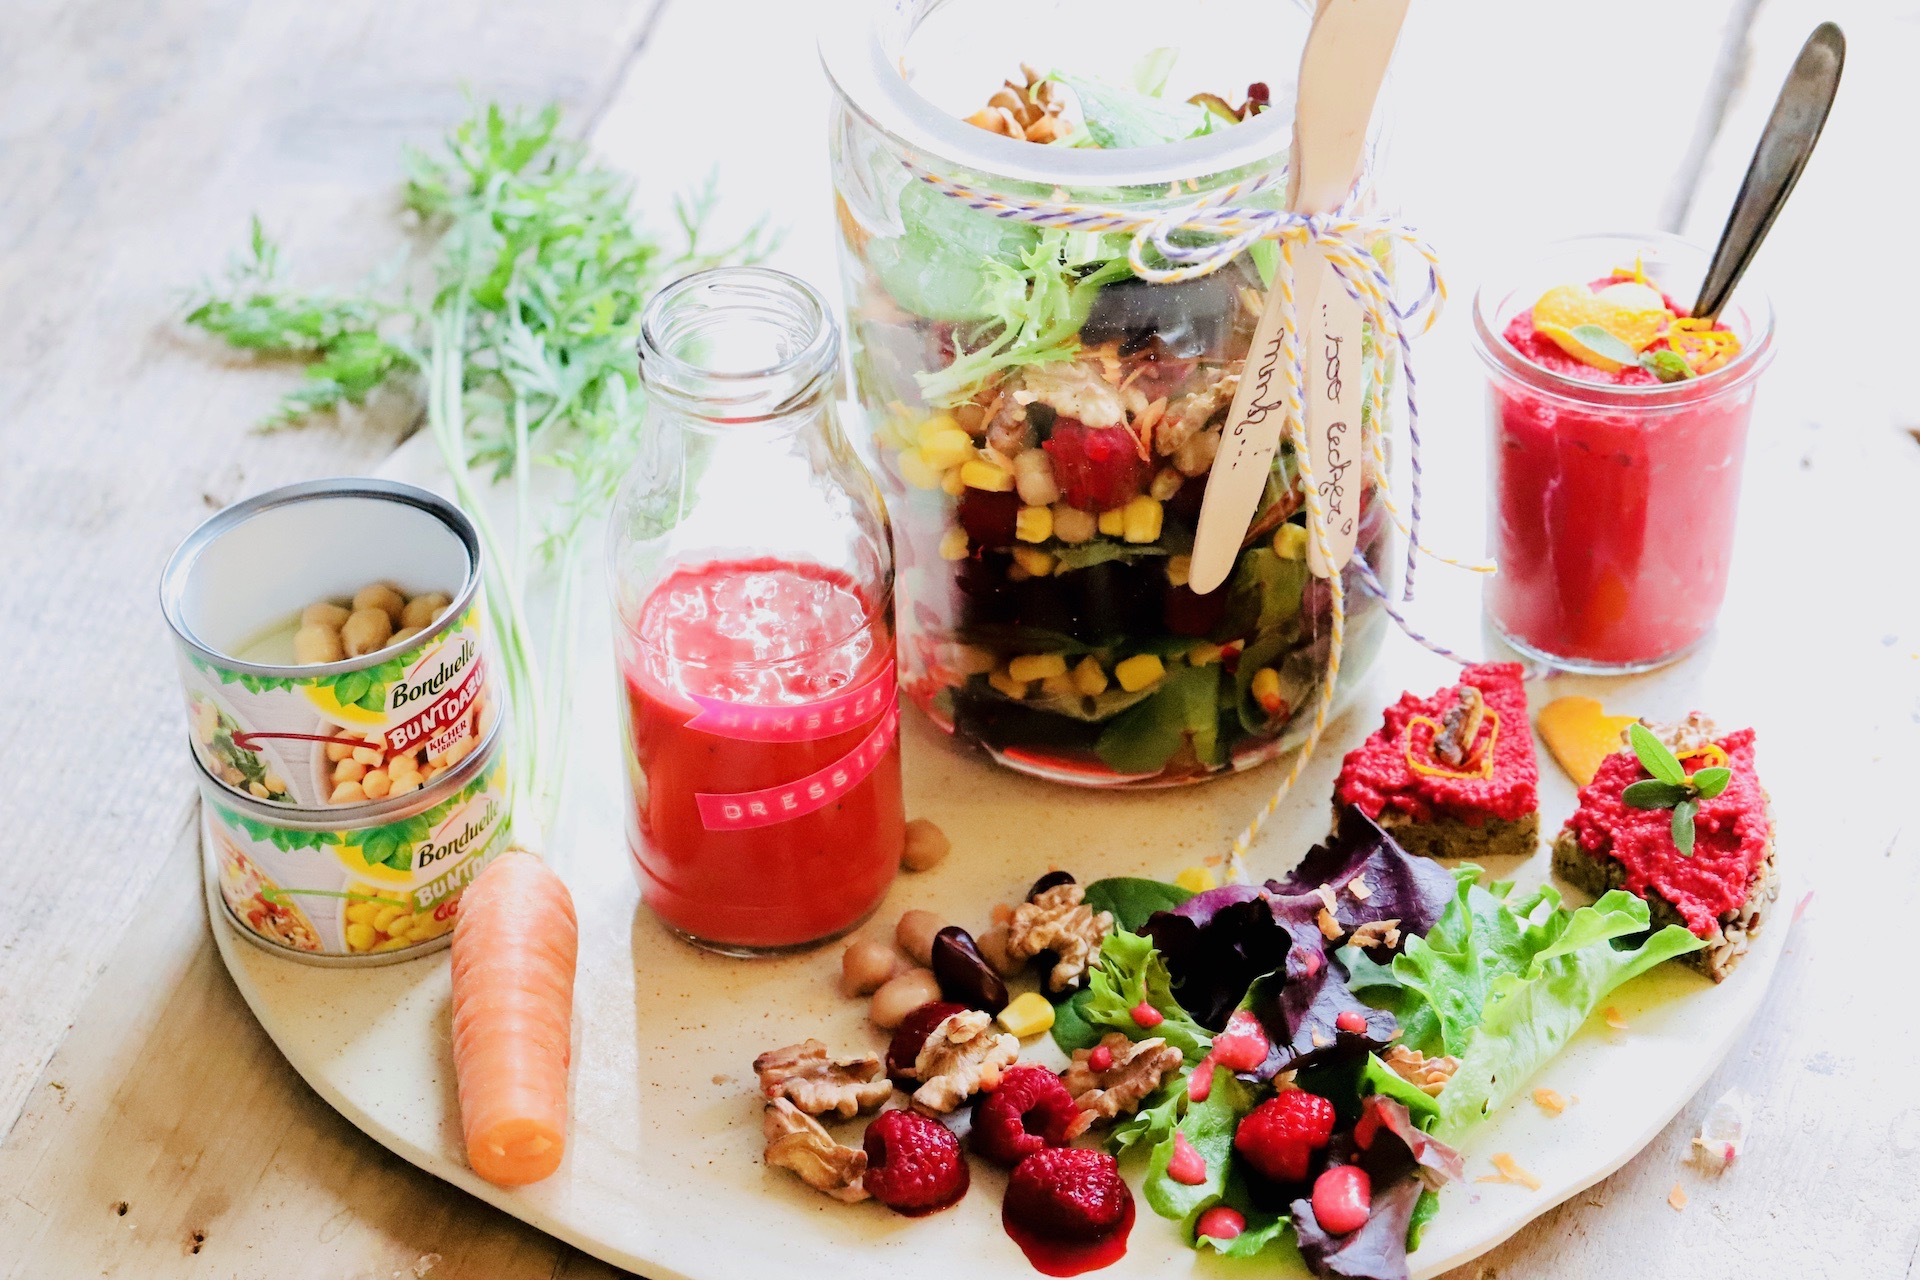 Herbst- bzw. Wintersalat easy & peasy zum Lunch im Büro